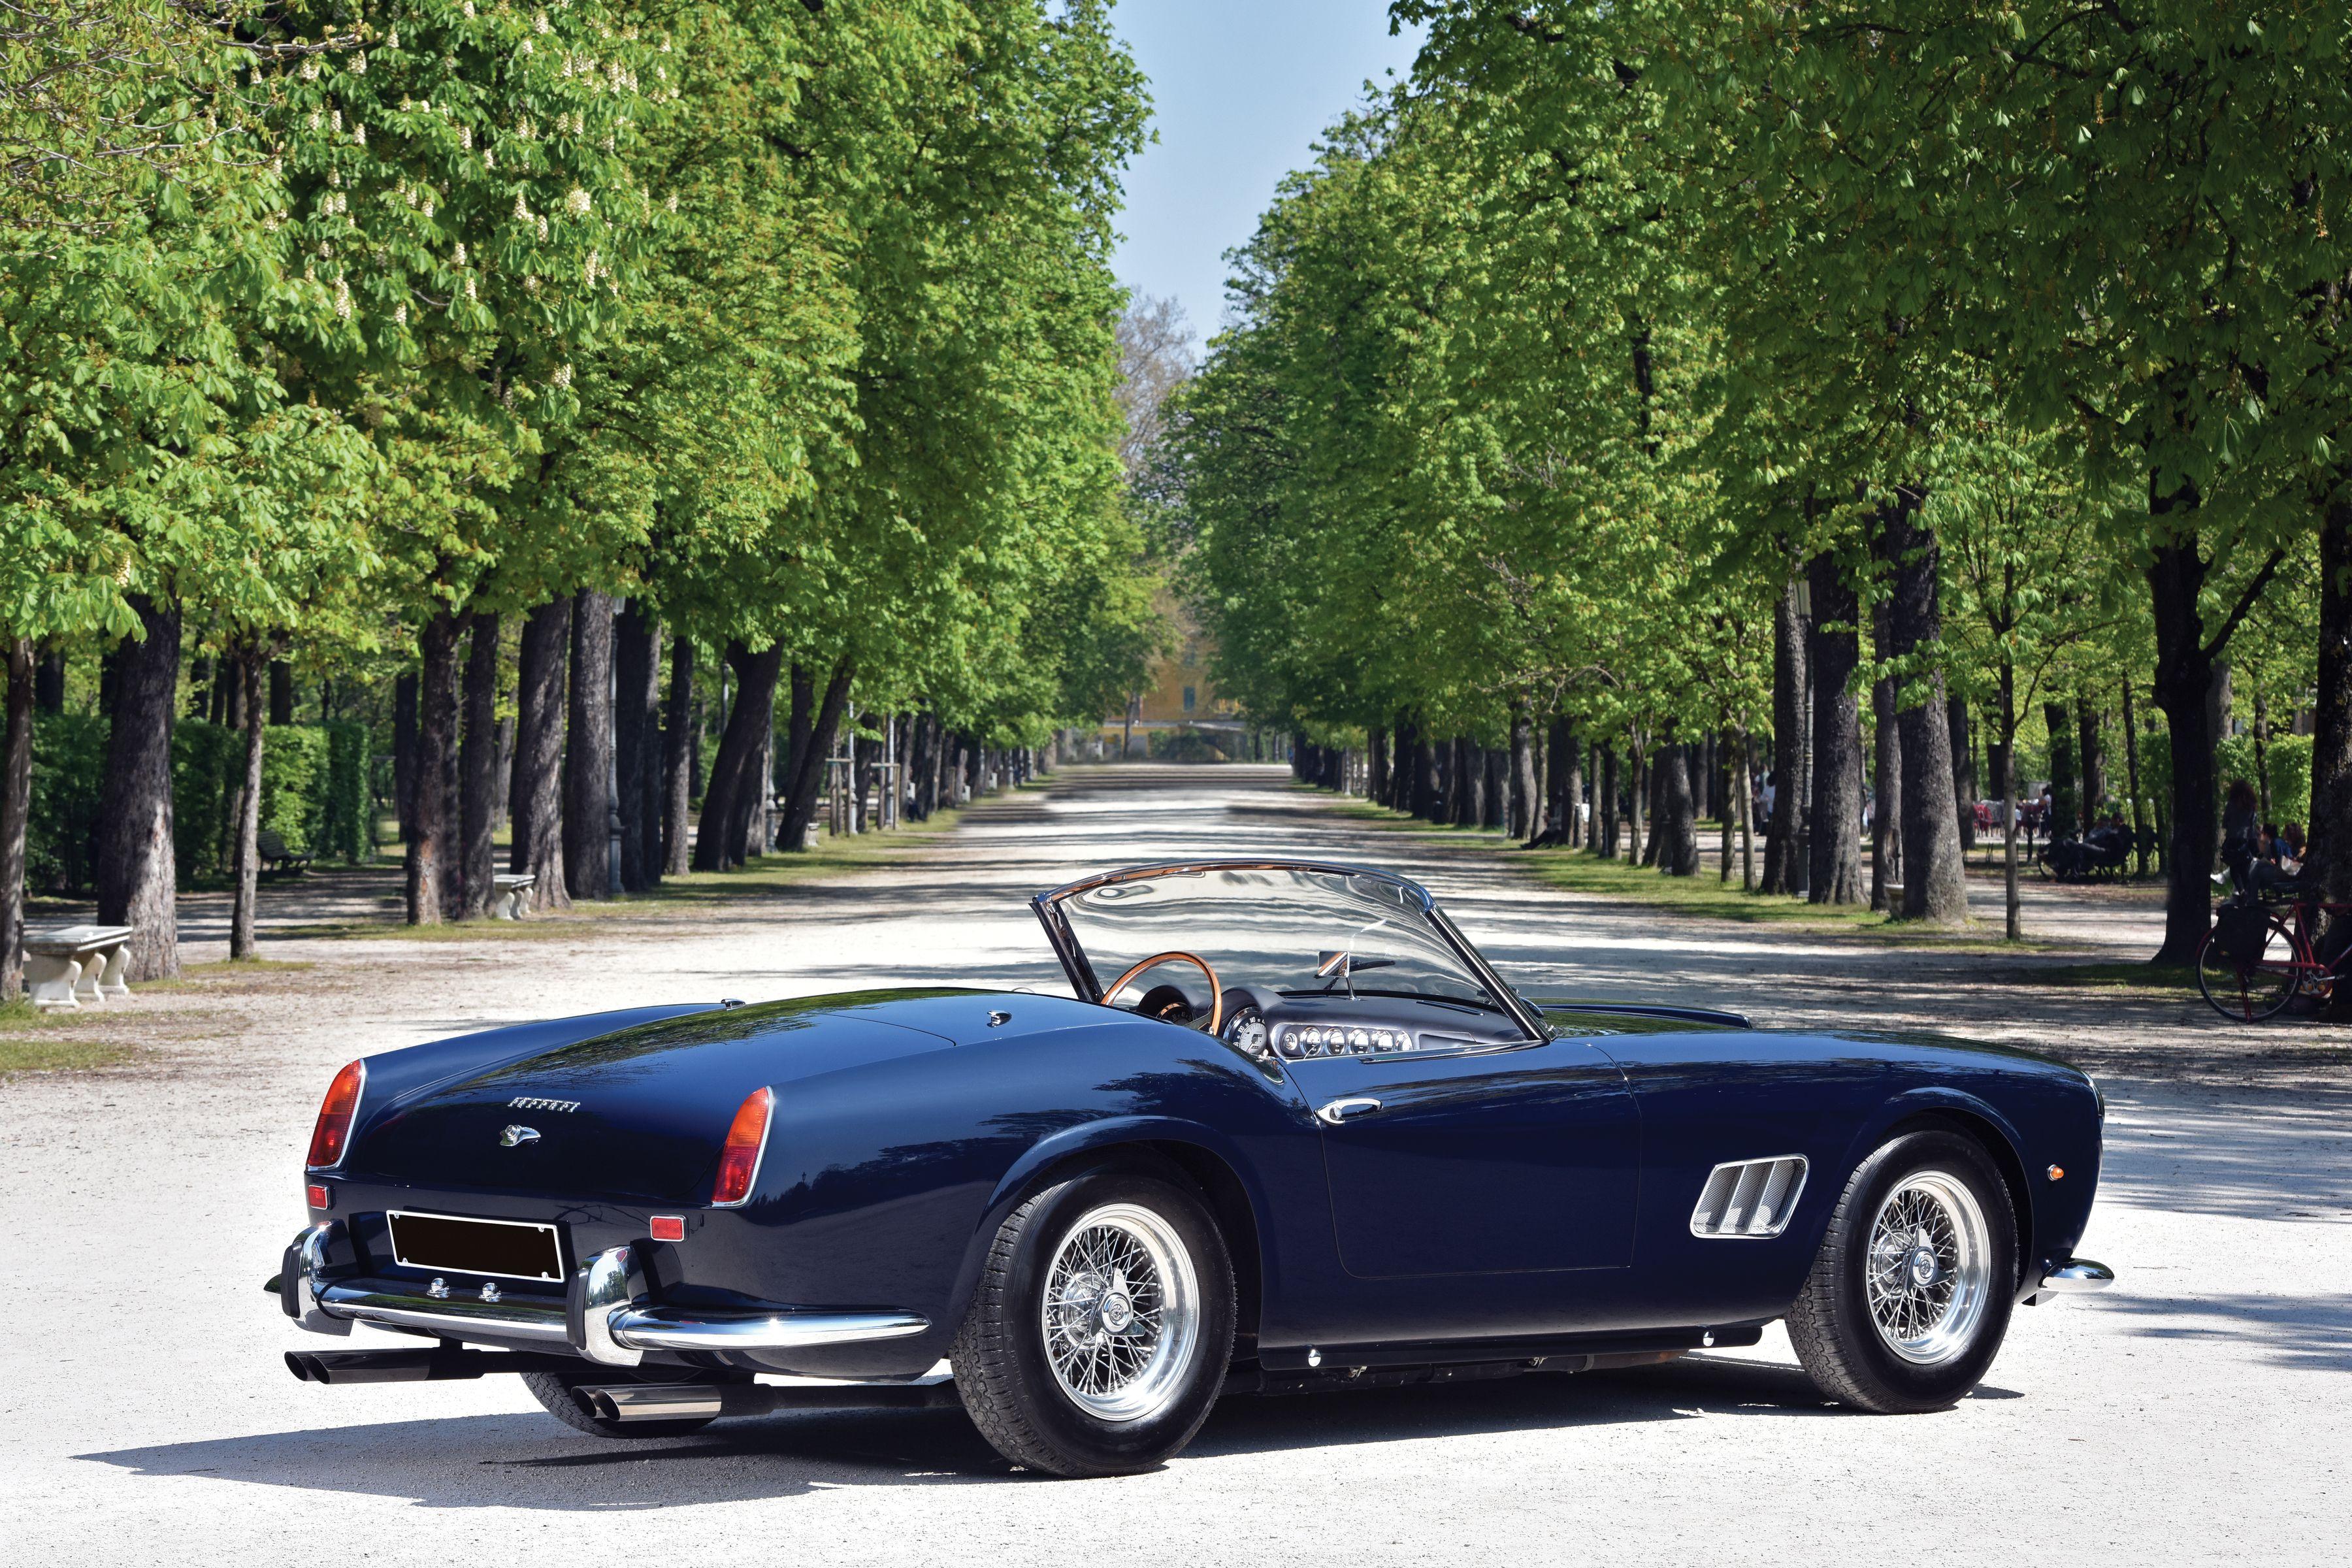 ed934132305199a1081357728bde6f7a Elegant Ferrari F 108 Al-mondial 8 Cars Trend